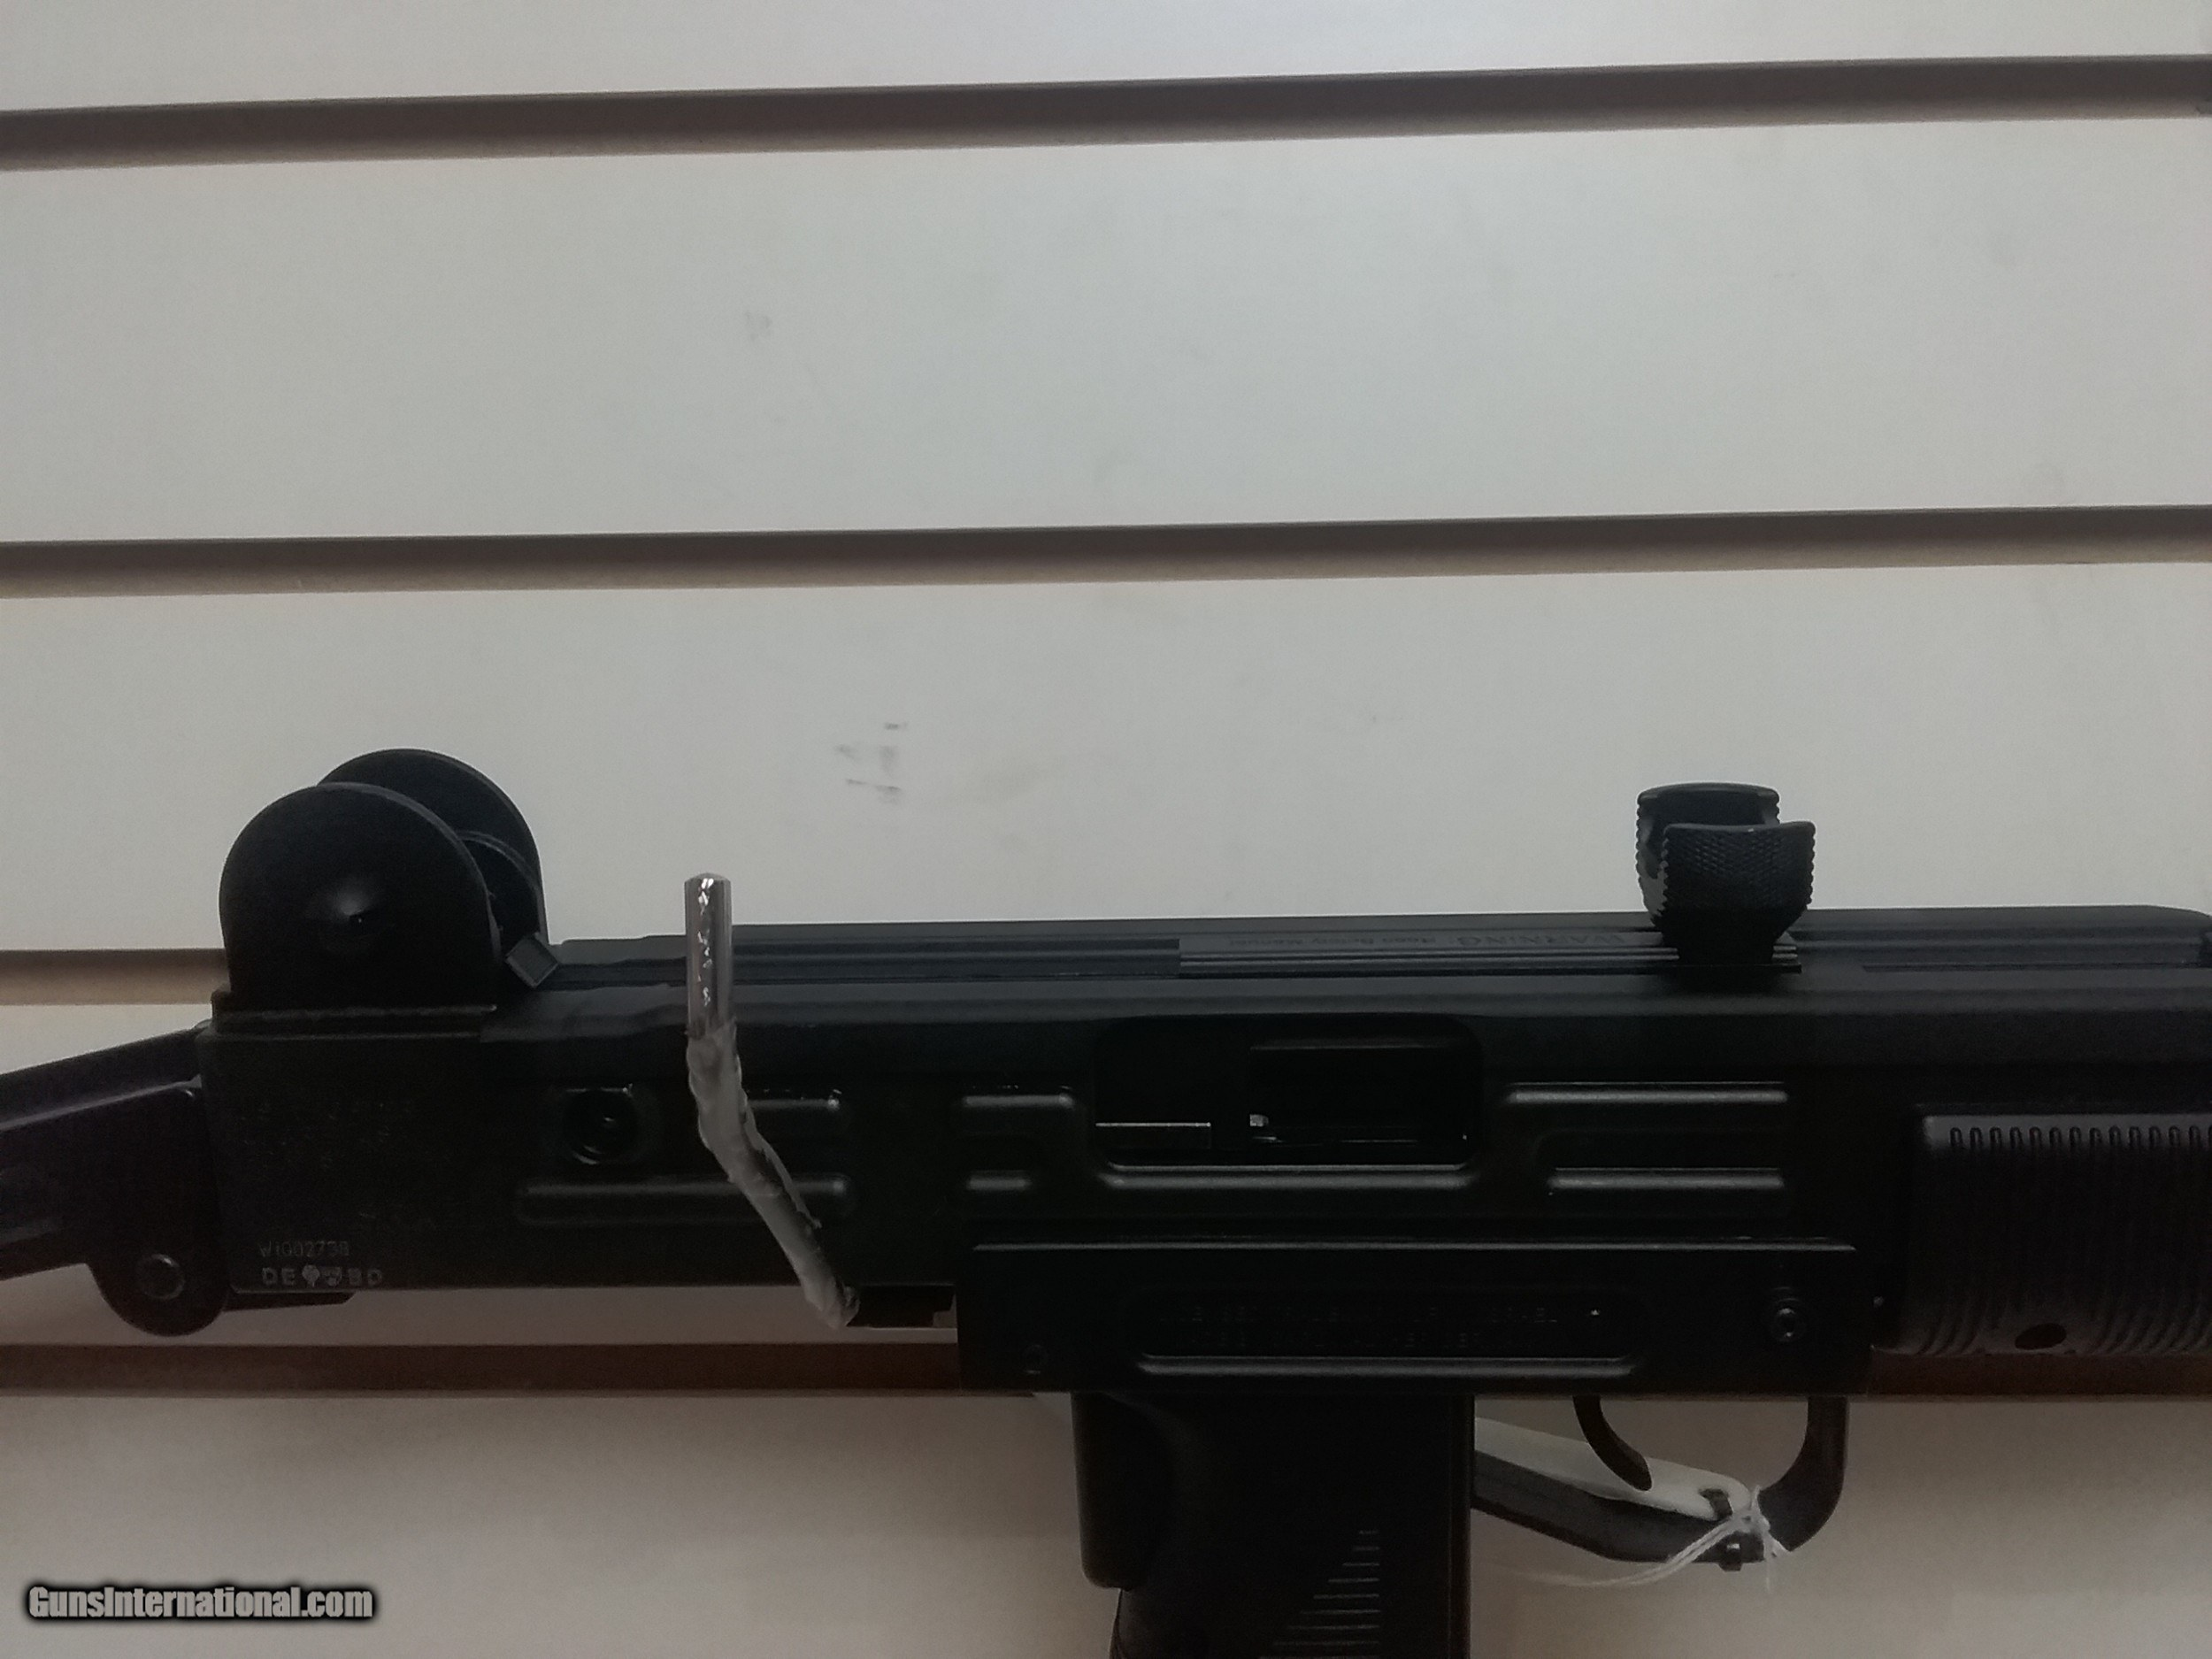 USED IWI MP UZI 22 CAL 20 ROUND CLIP UNFIRED NO BOX for sale